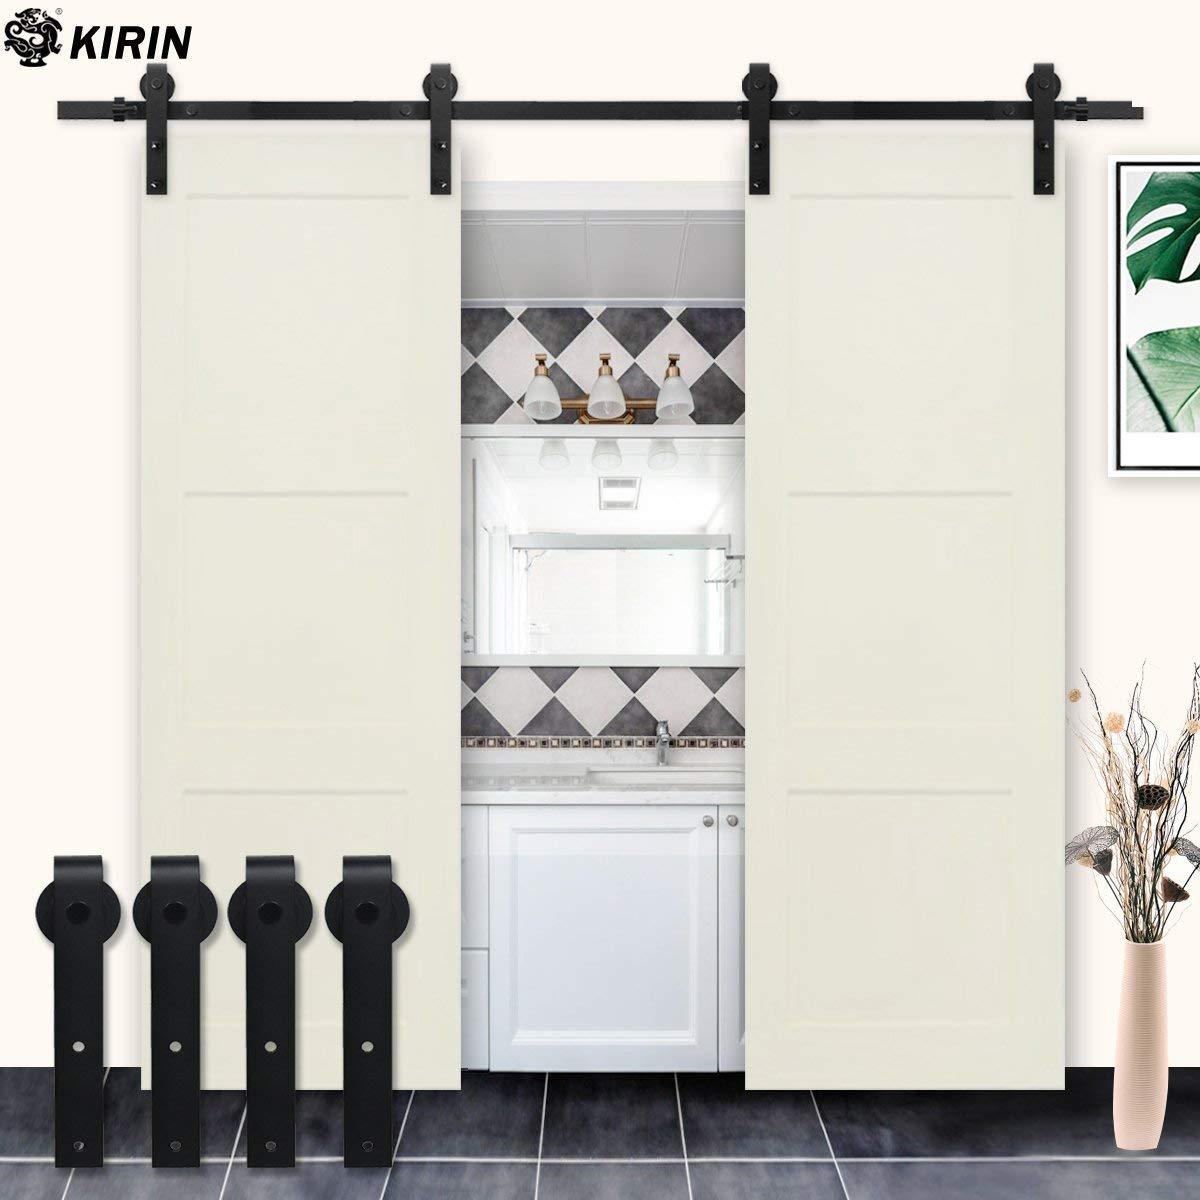 Get Quotations Kirin Country Simple Style Flat Shape Double Doors Wood Door Interior Closet Barn Hardware Accessories